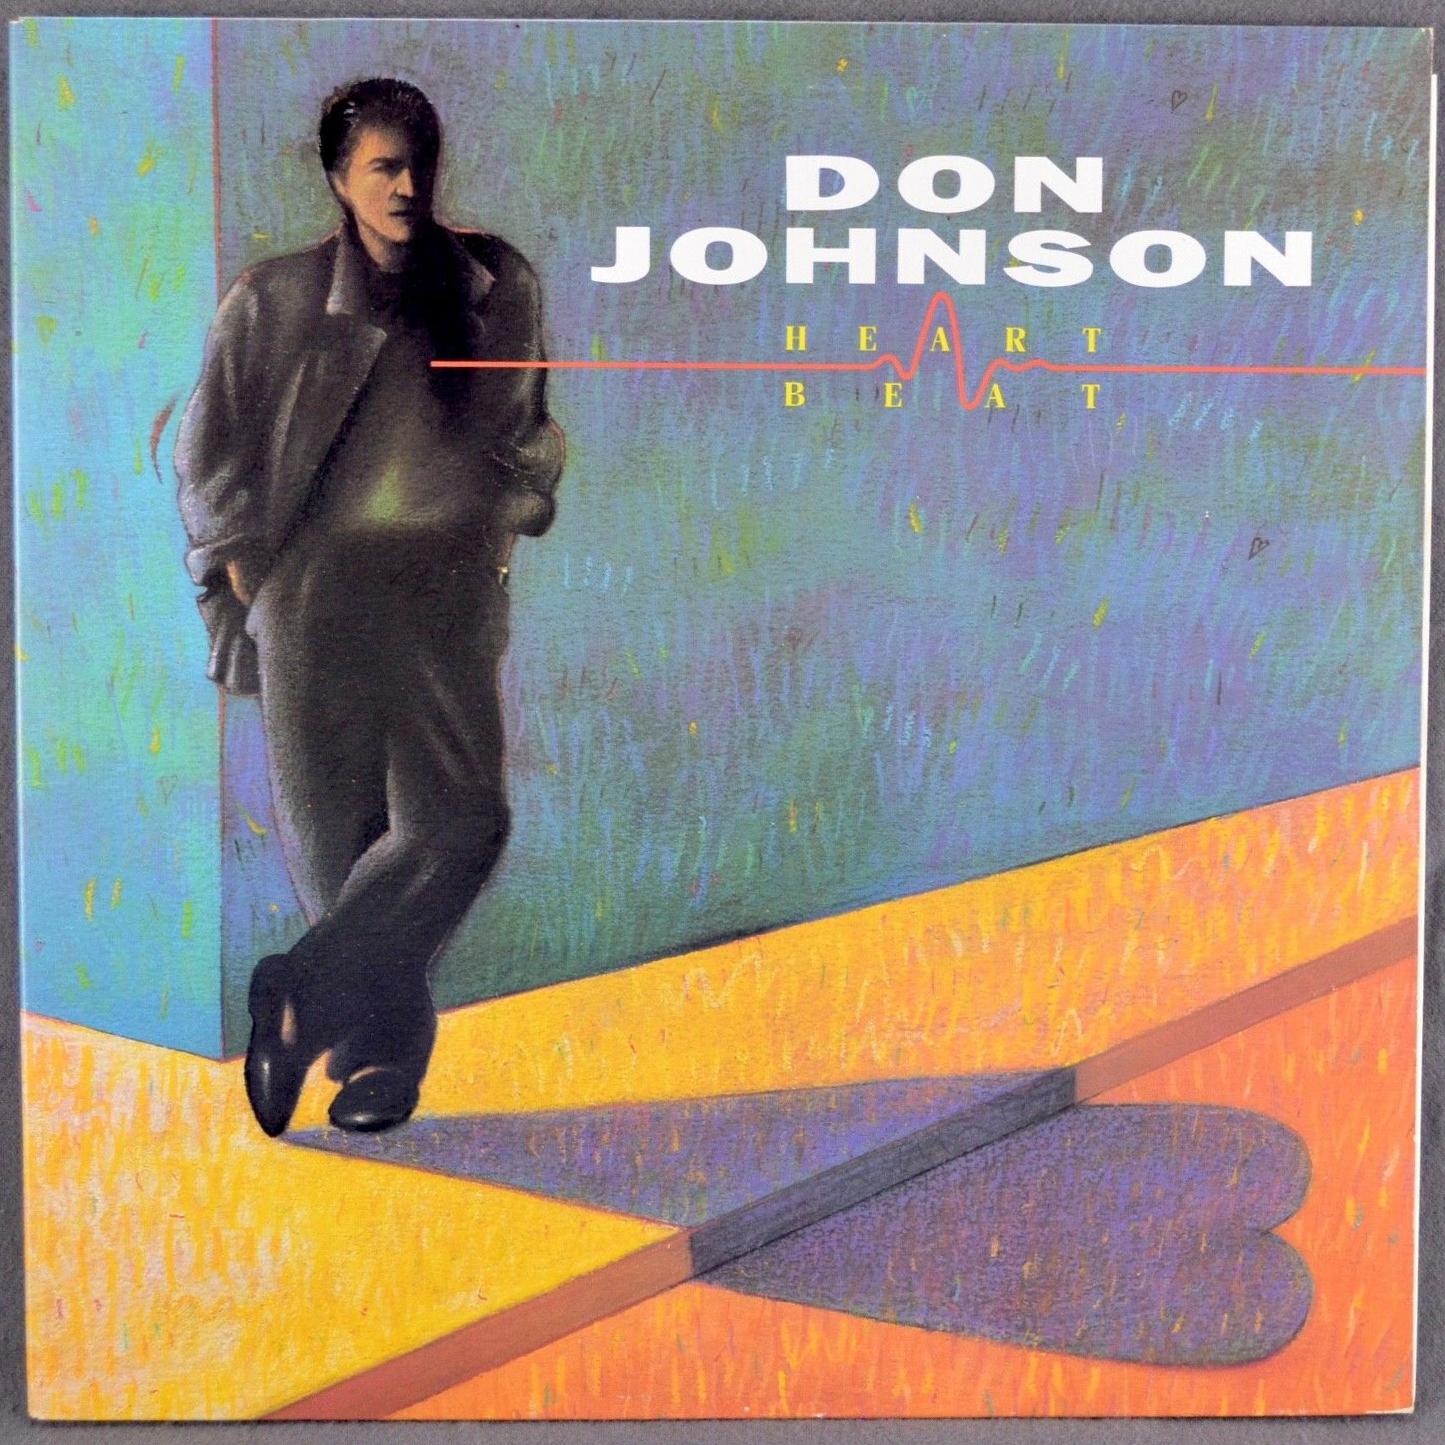 dj50s ep131 sleeve donjohnson